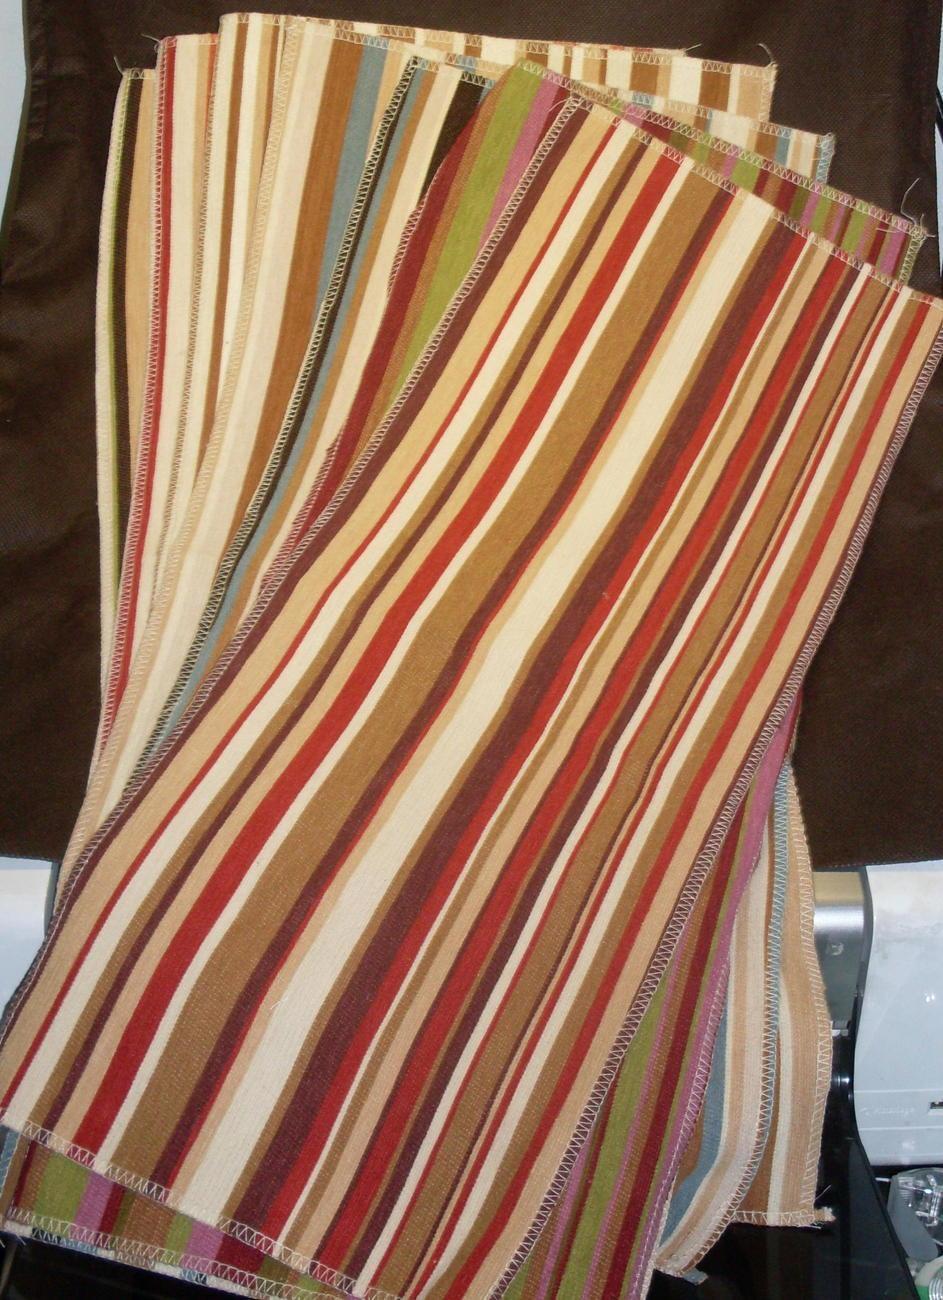 Selection of Striped Fabrics 7 lg pcs Various Colors Villa Nova